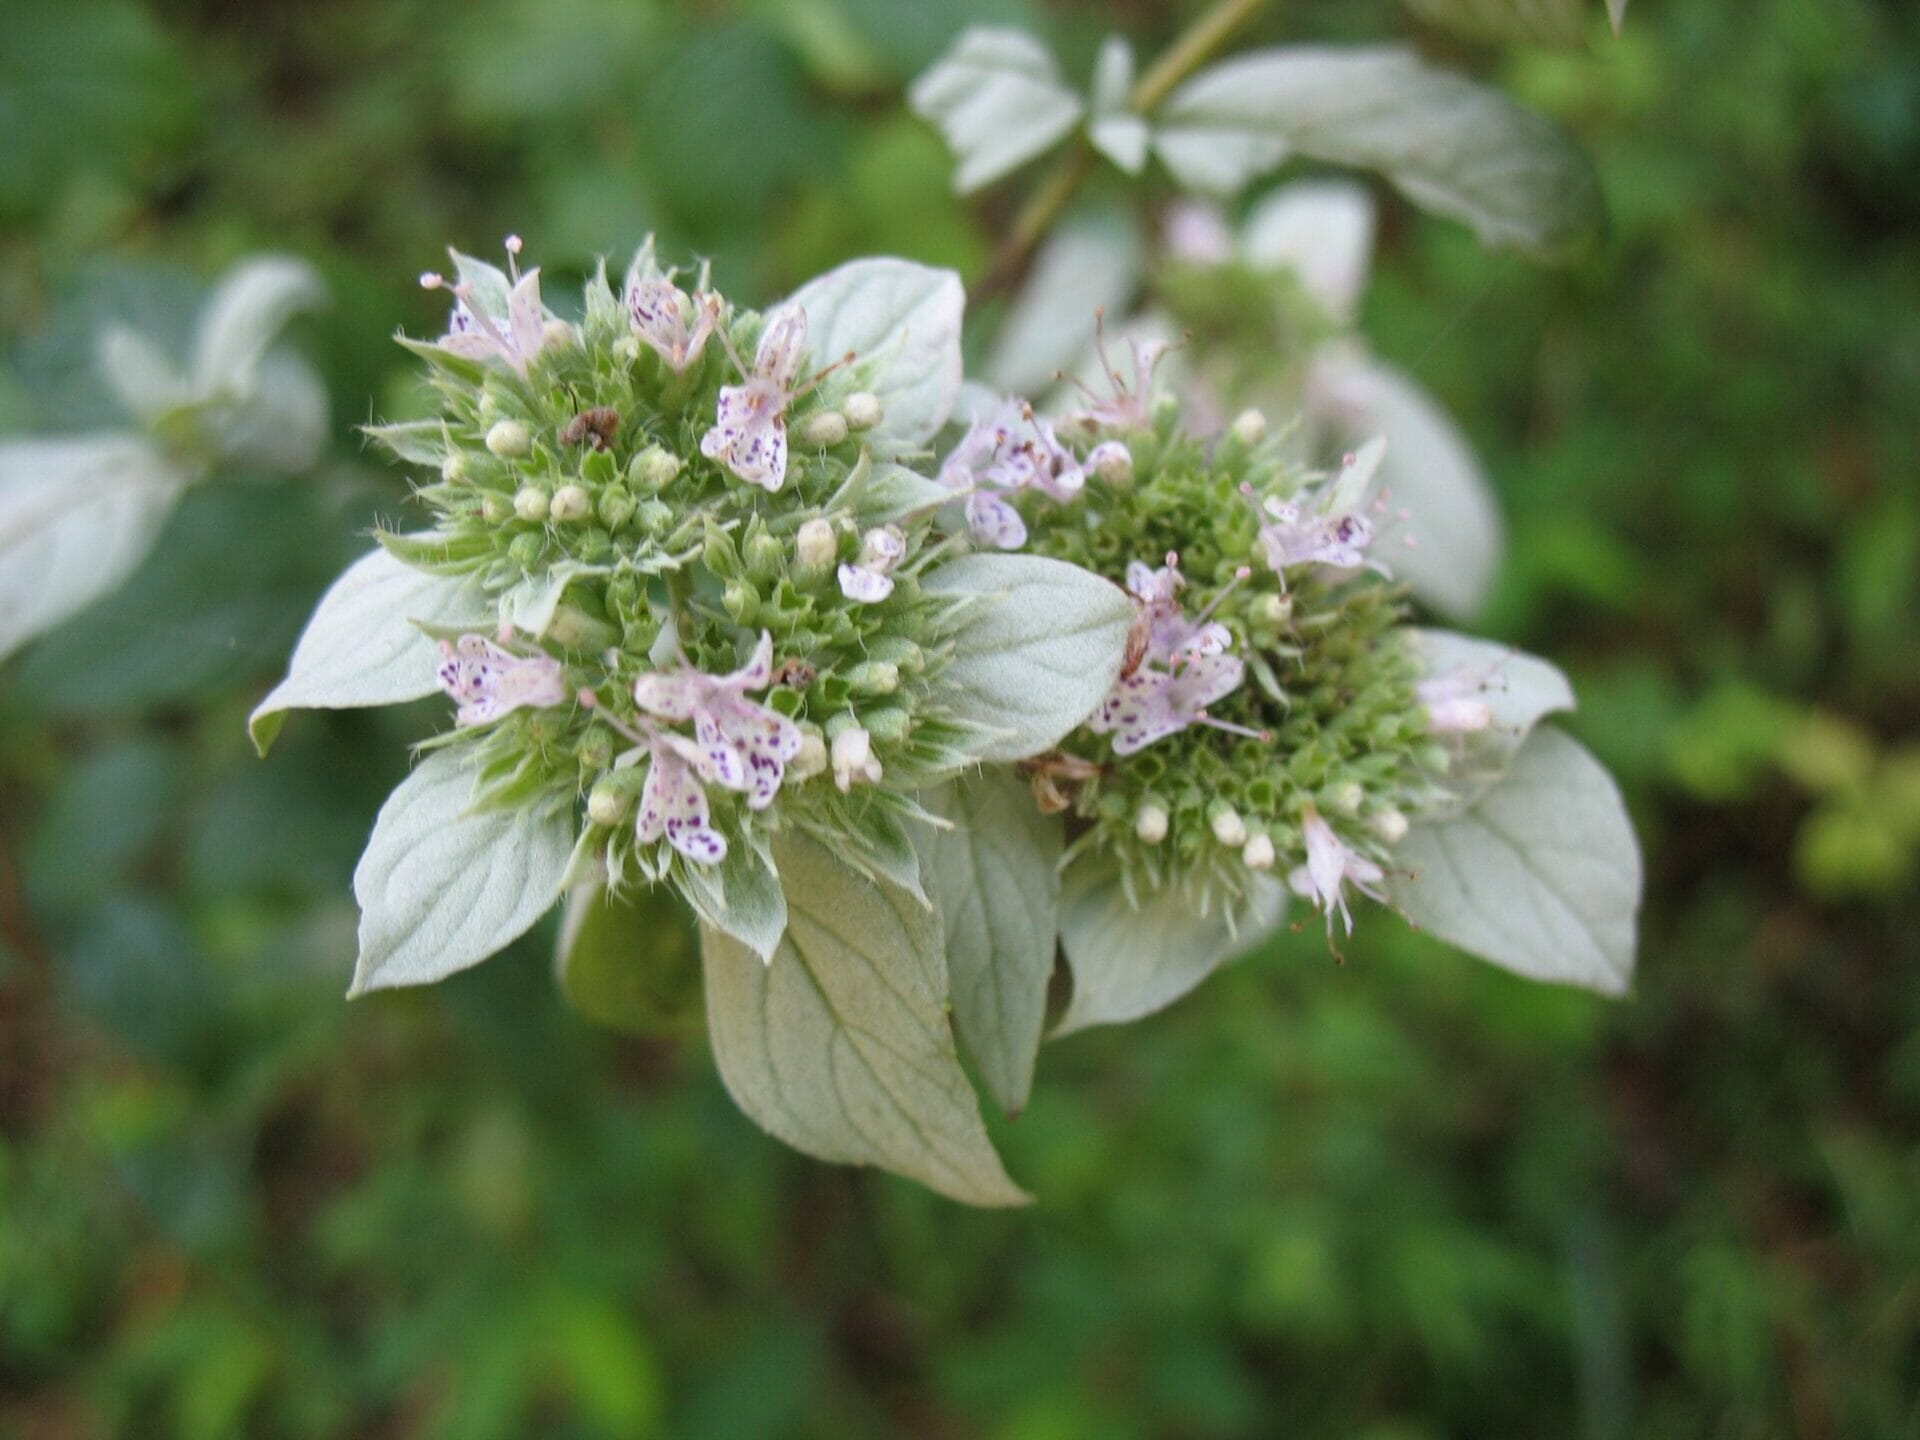 pycnanthemum pycnanthemoides 009